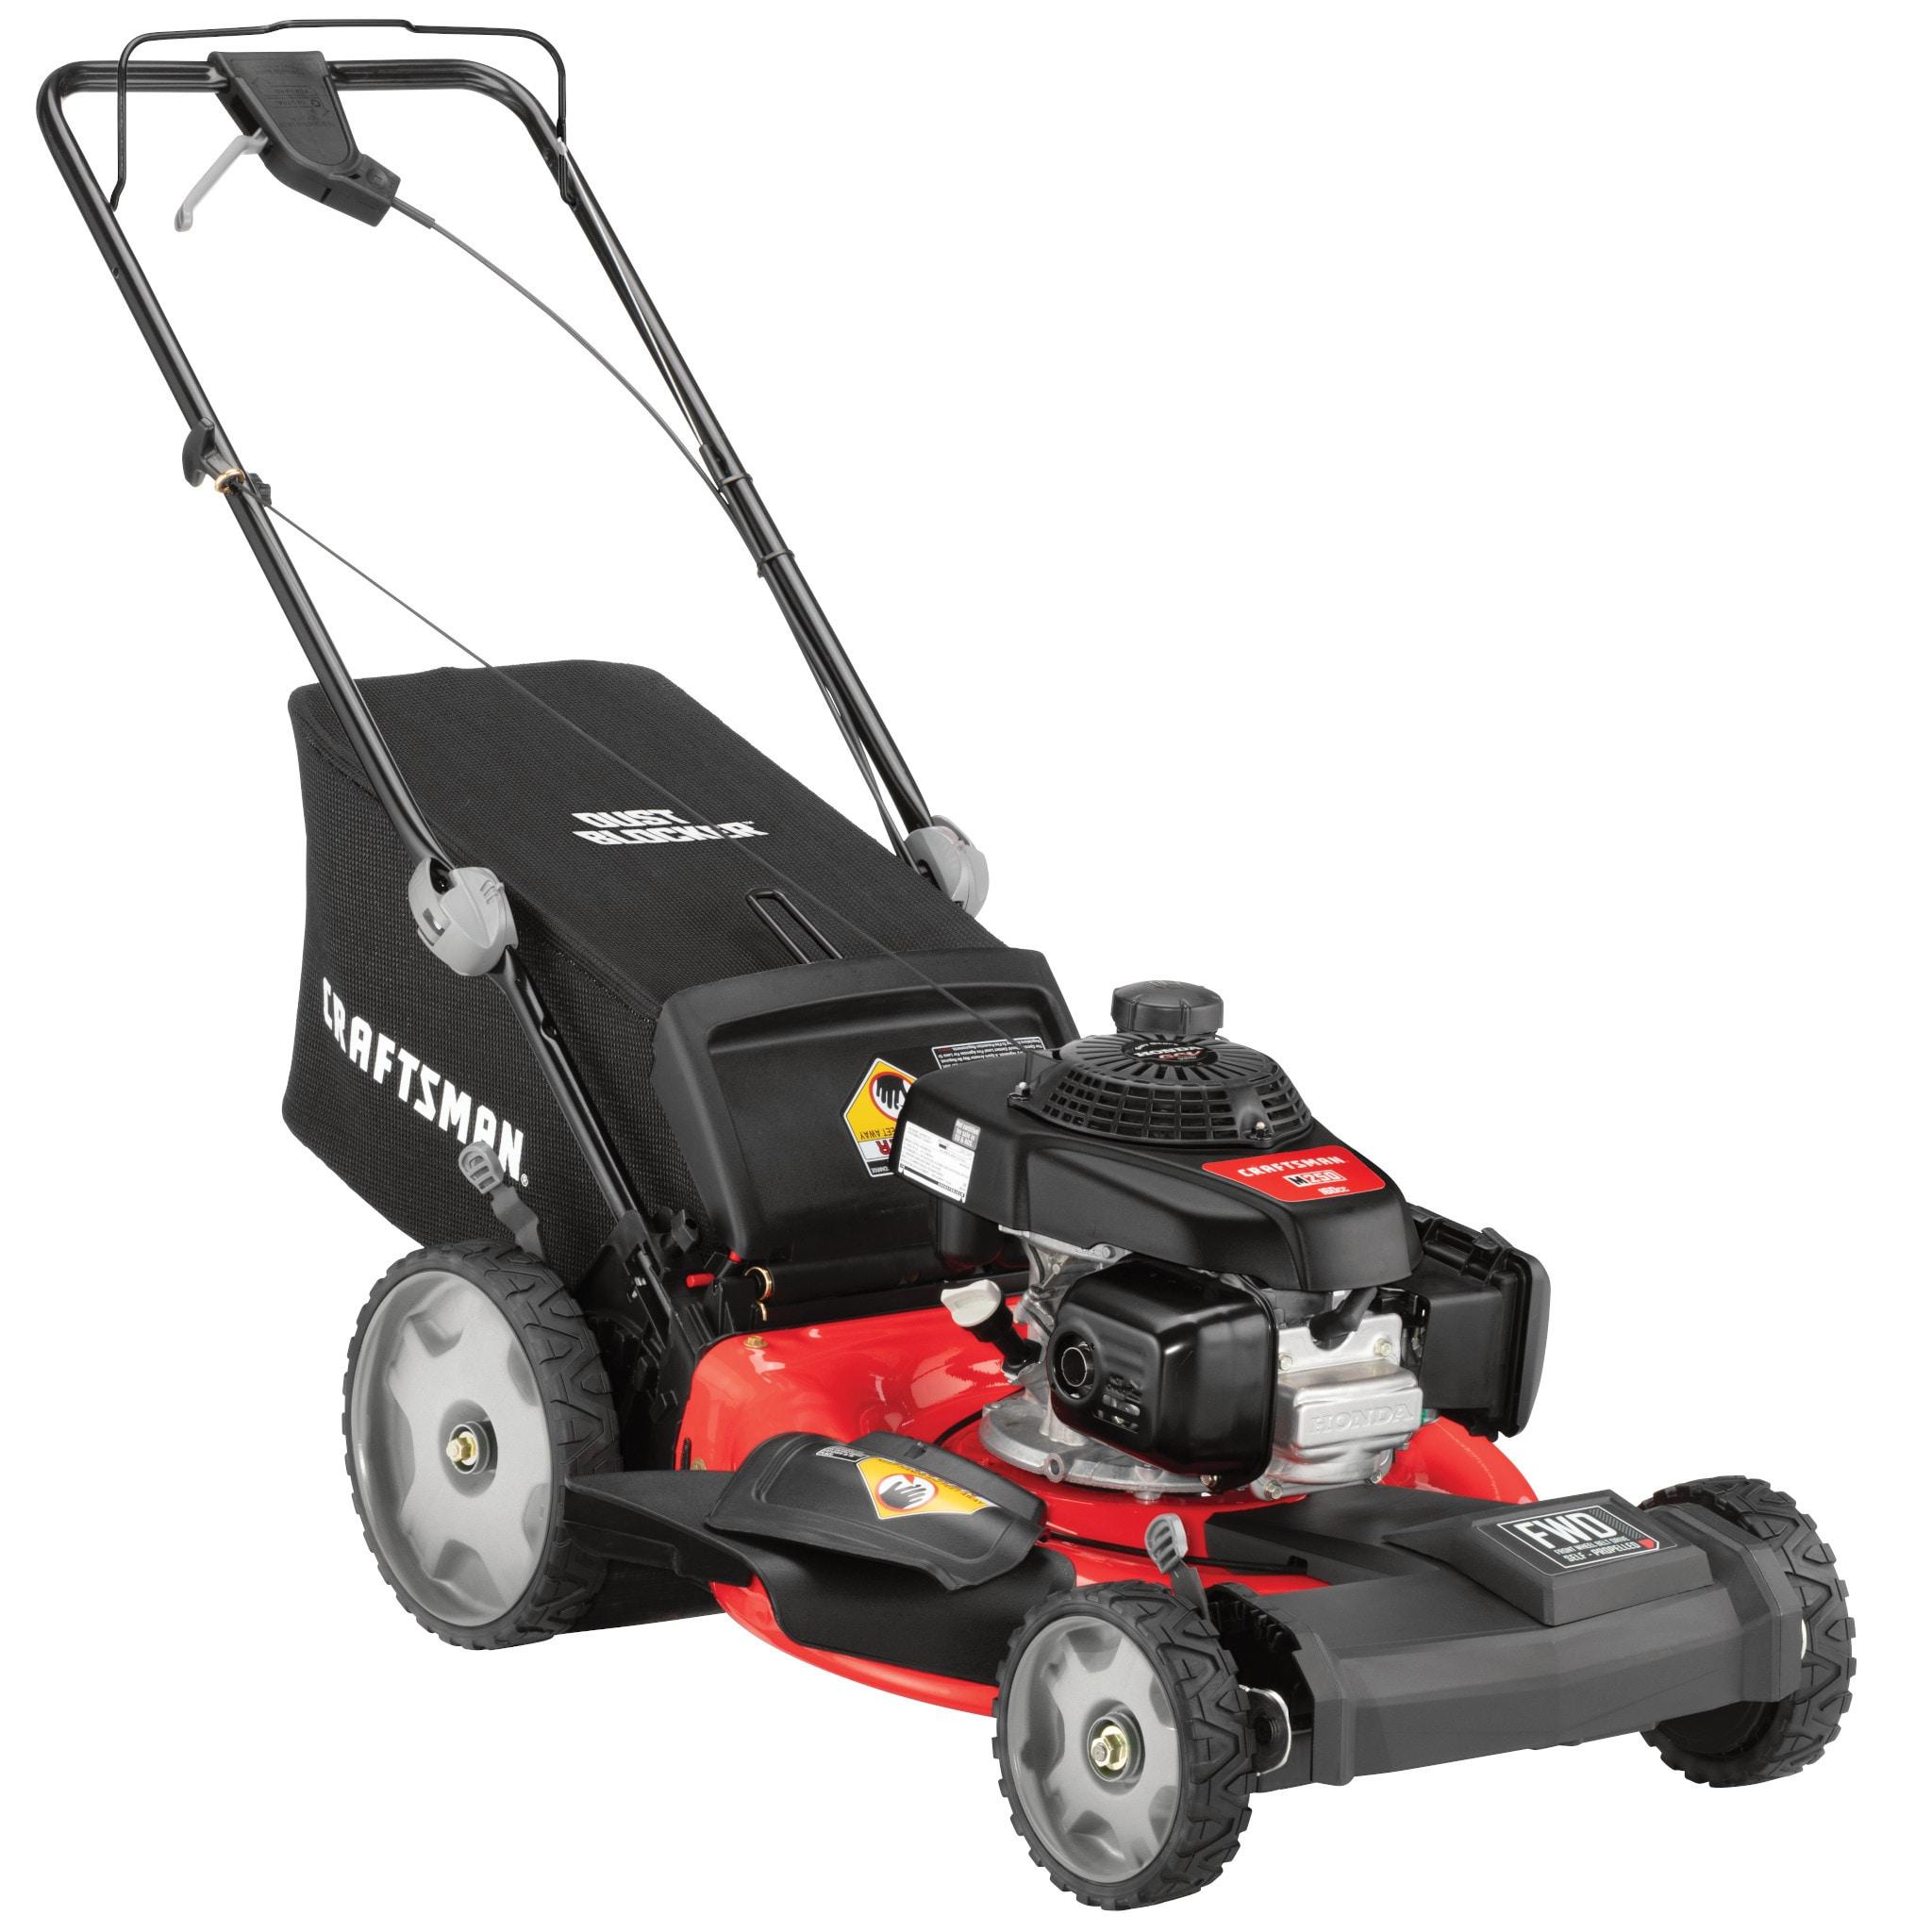 CRAFTSMAN M250 160-cc 21-in Self-Propelled Gas Push Lawn Mower with Honda Engine | CMXGMAM1125503